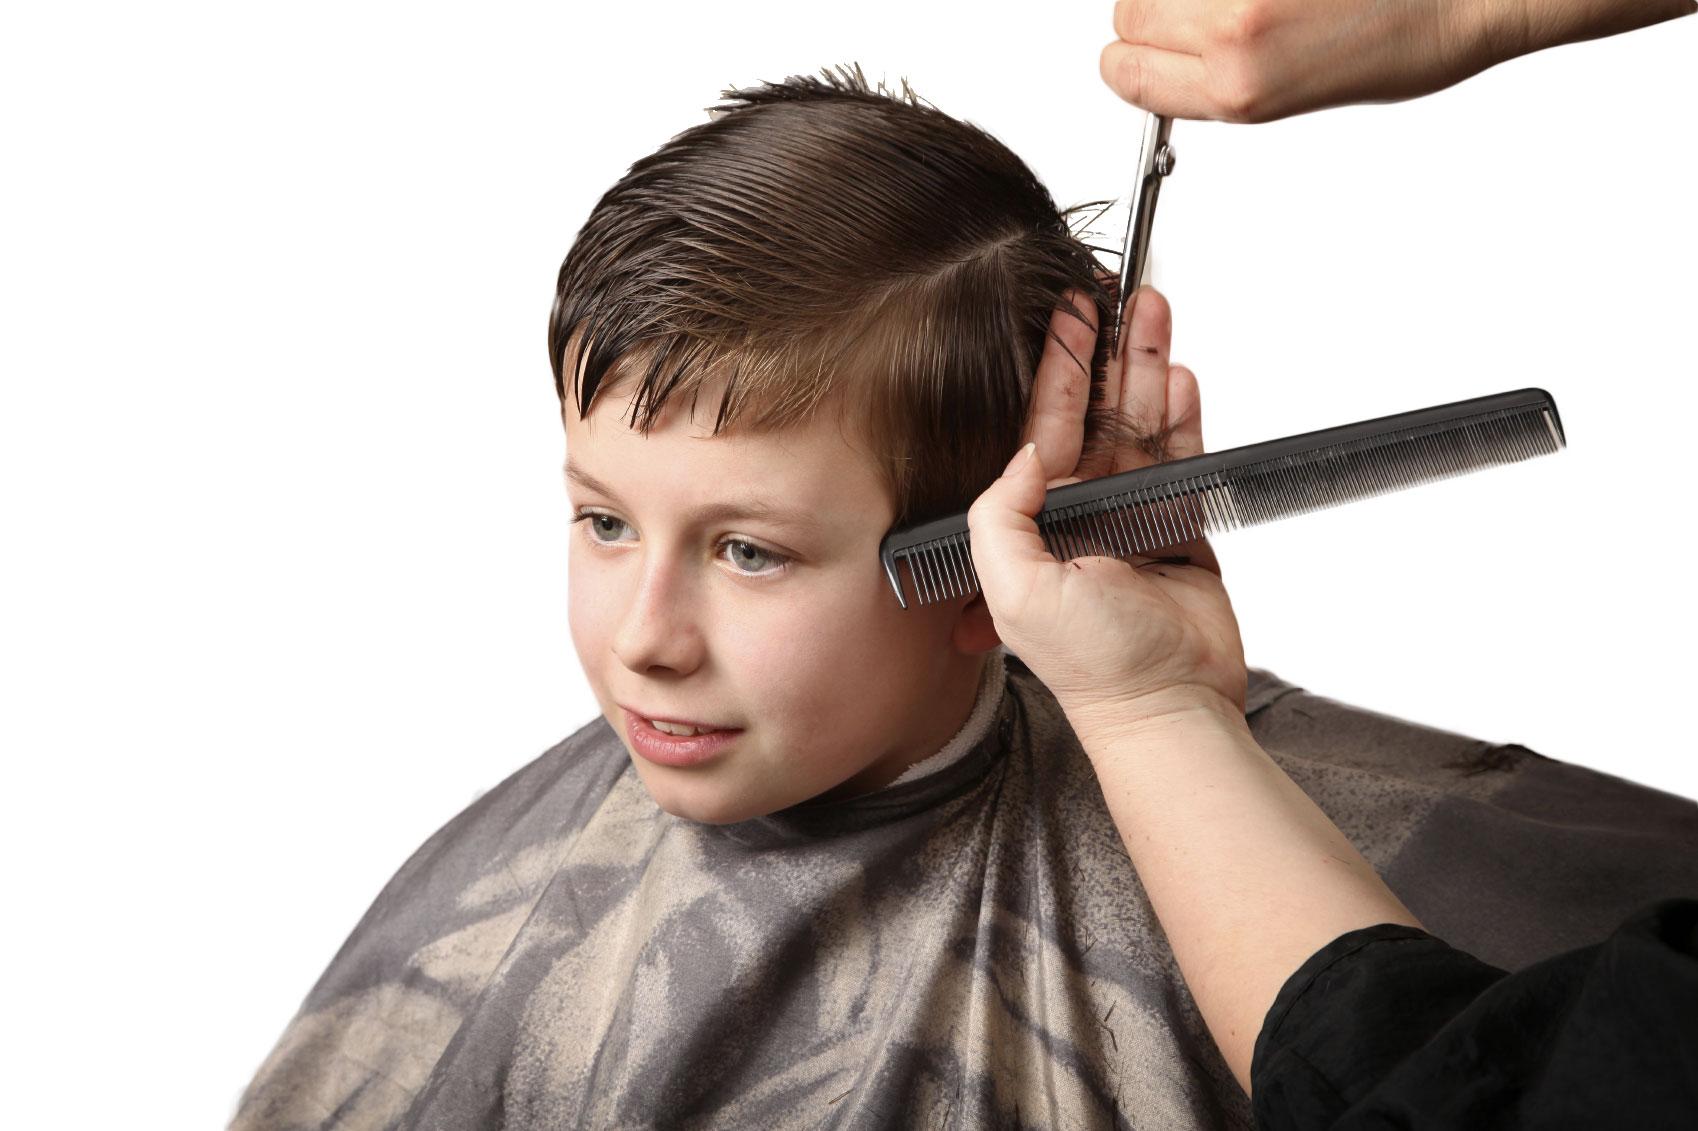 Young Boy Haircut